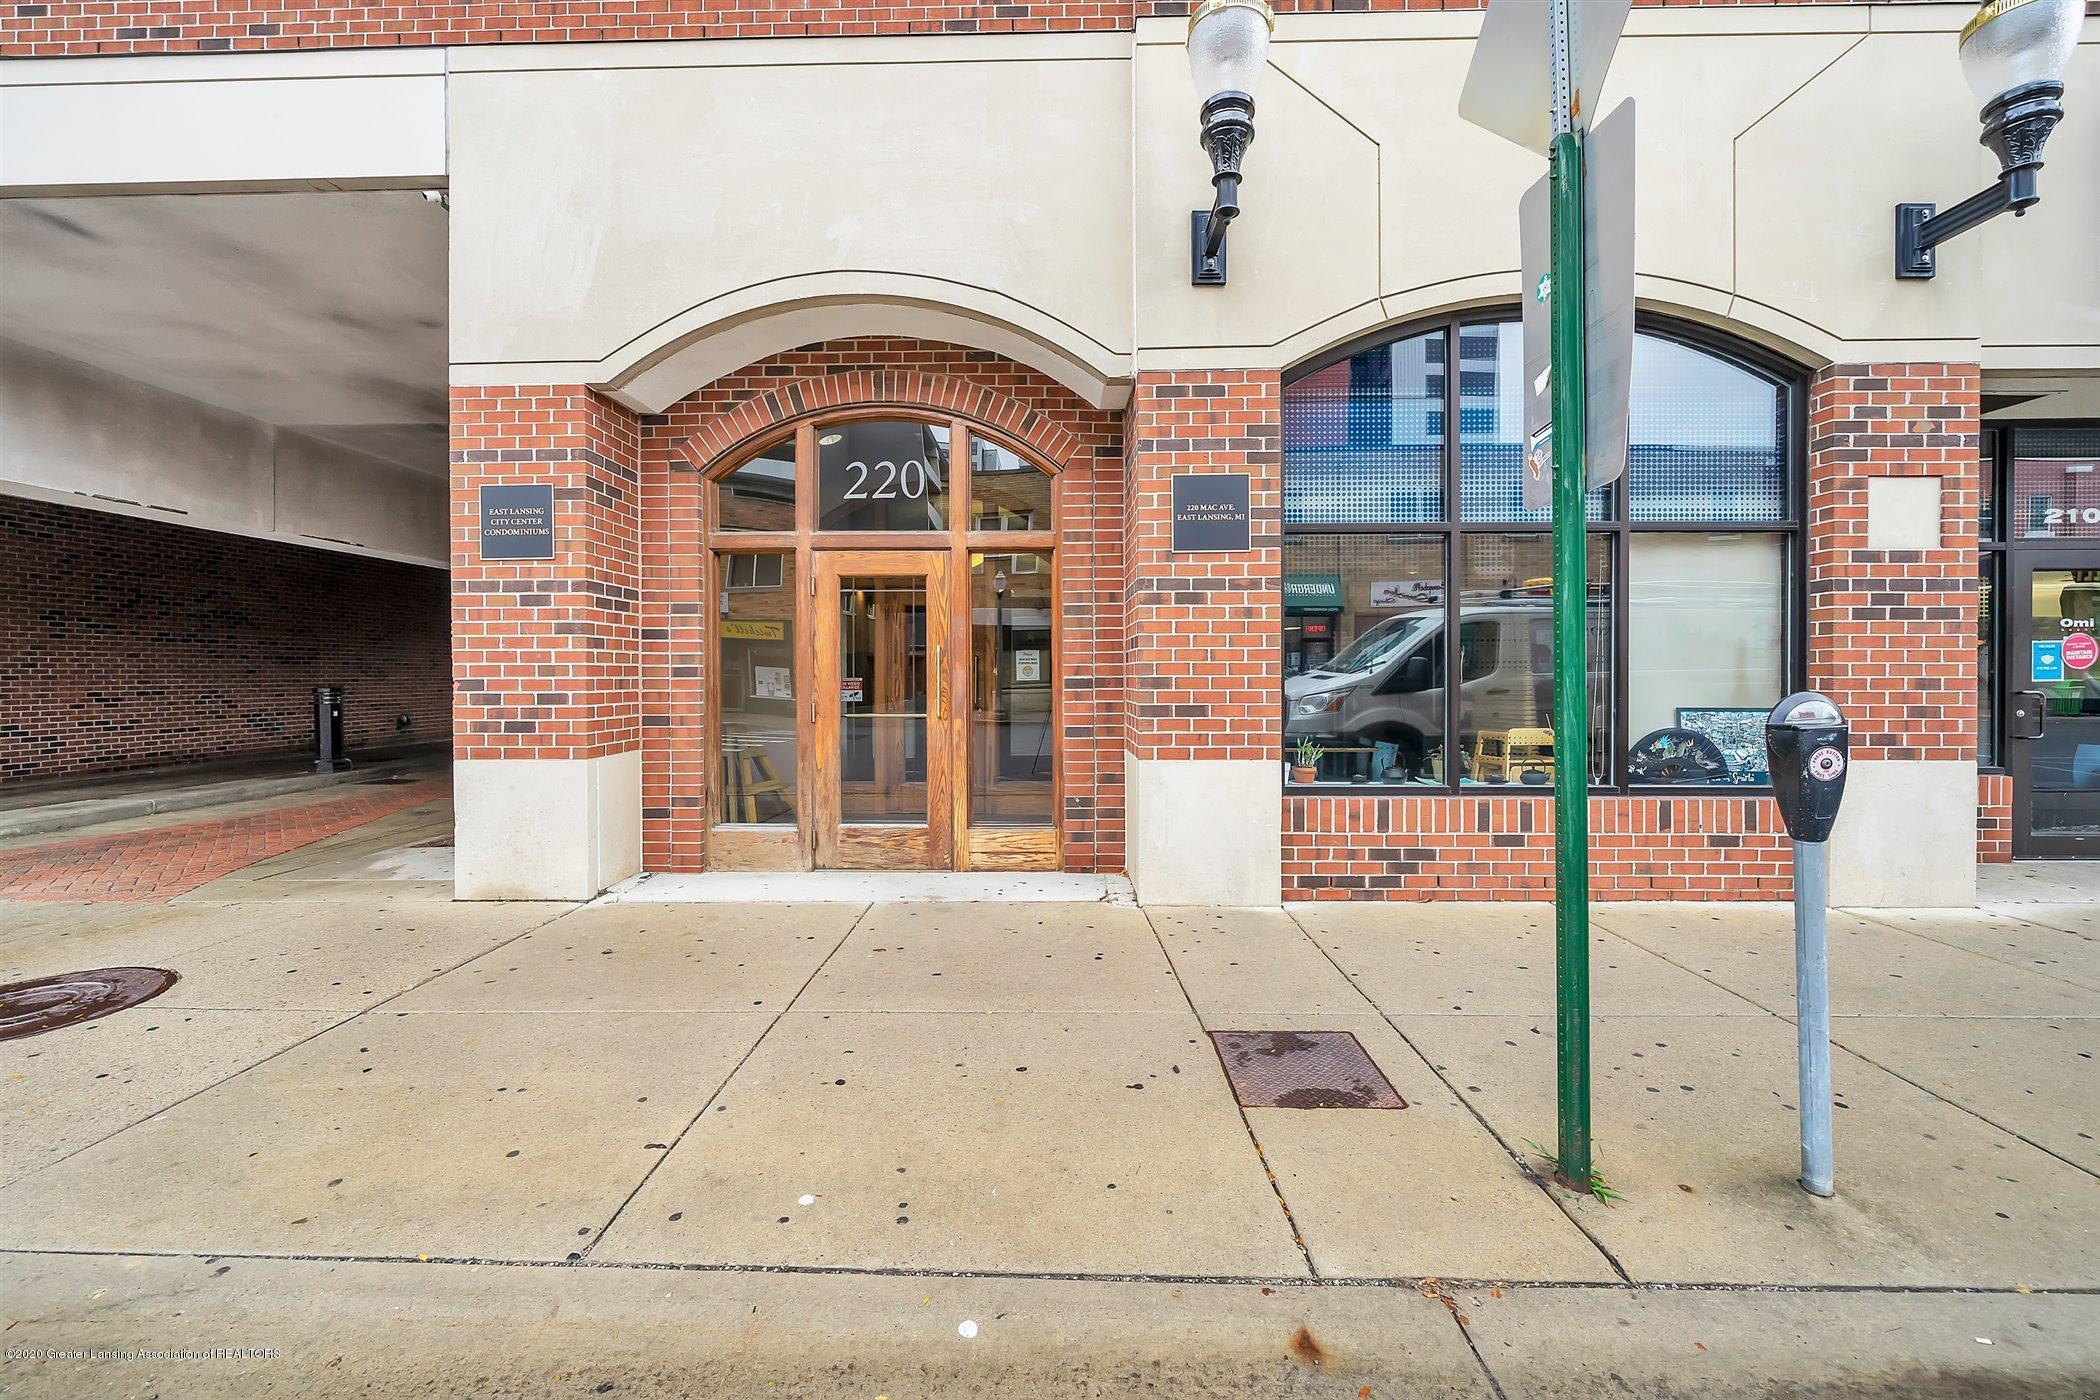 220 M. A. C. Ave Apt 409 - EXTERIOR Entrance to Building - 5